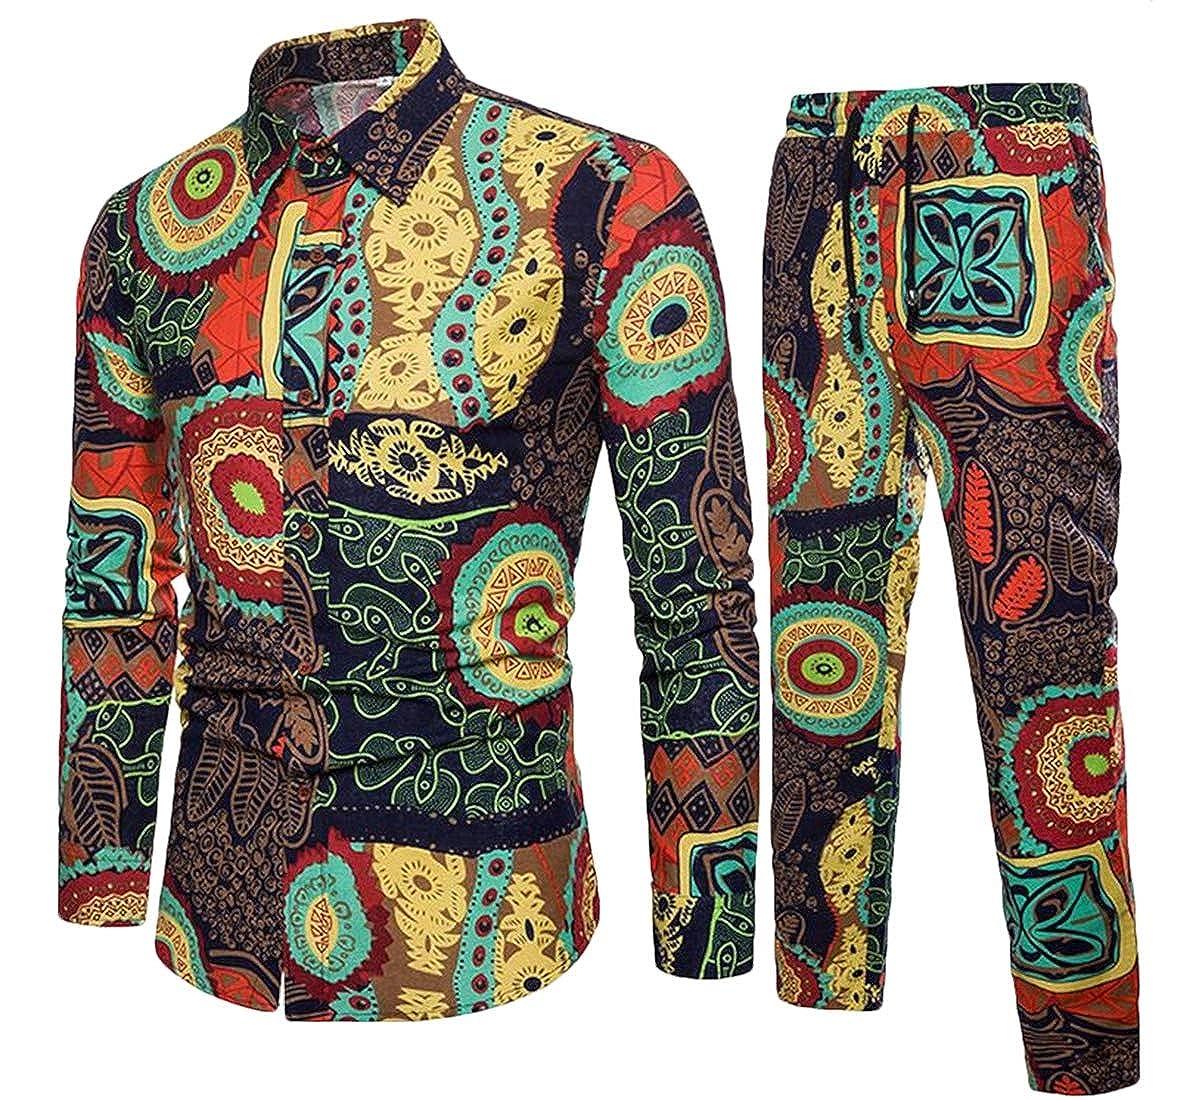 608c6f81a0 Yellow BU2H Men Clubwear Clubwear Clubwear Linen Cotton Leisure 2 Piece Set  Over SizedJogging Athletic Set 870de6